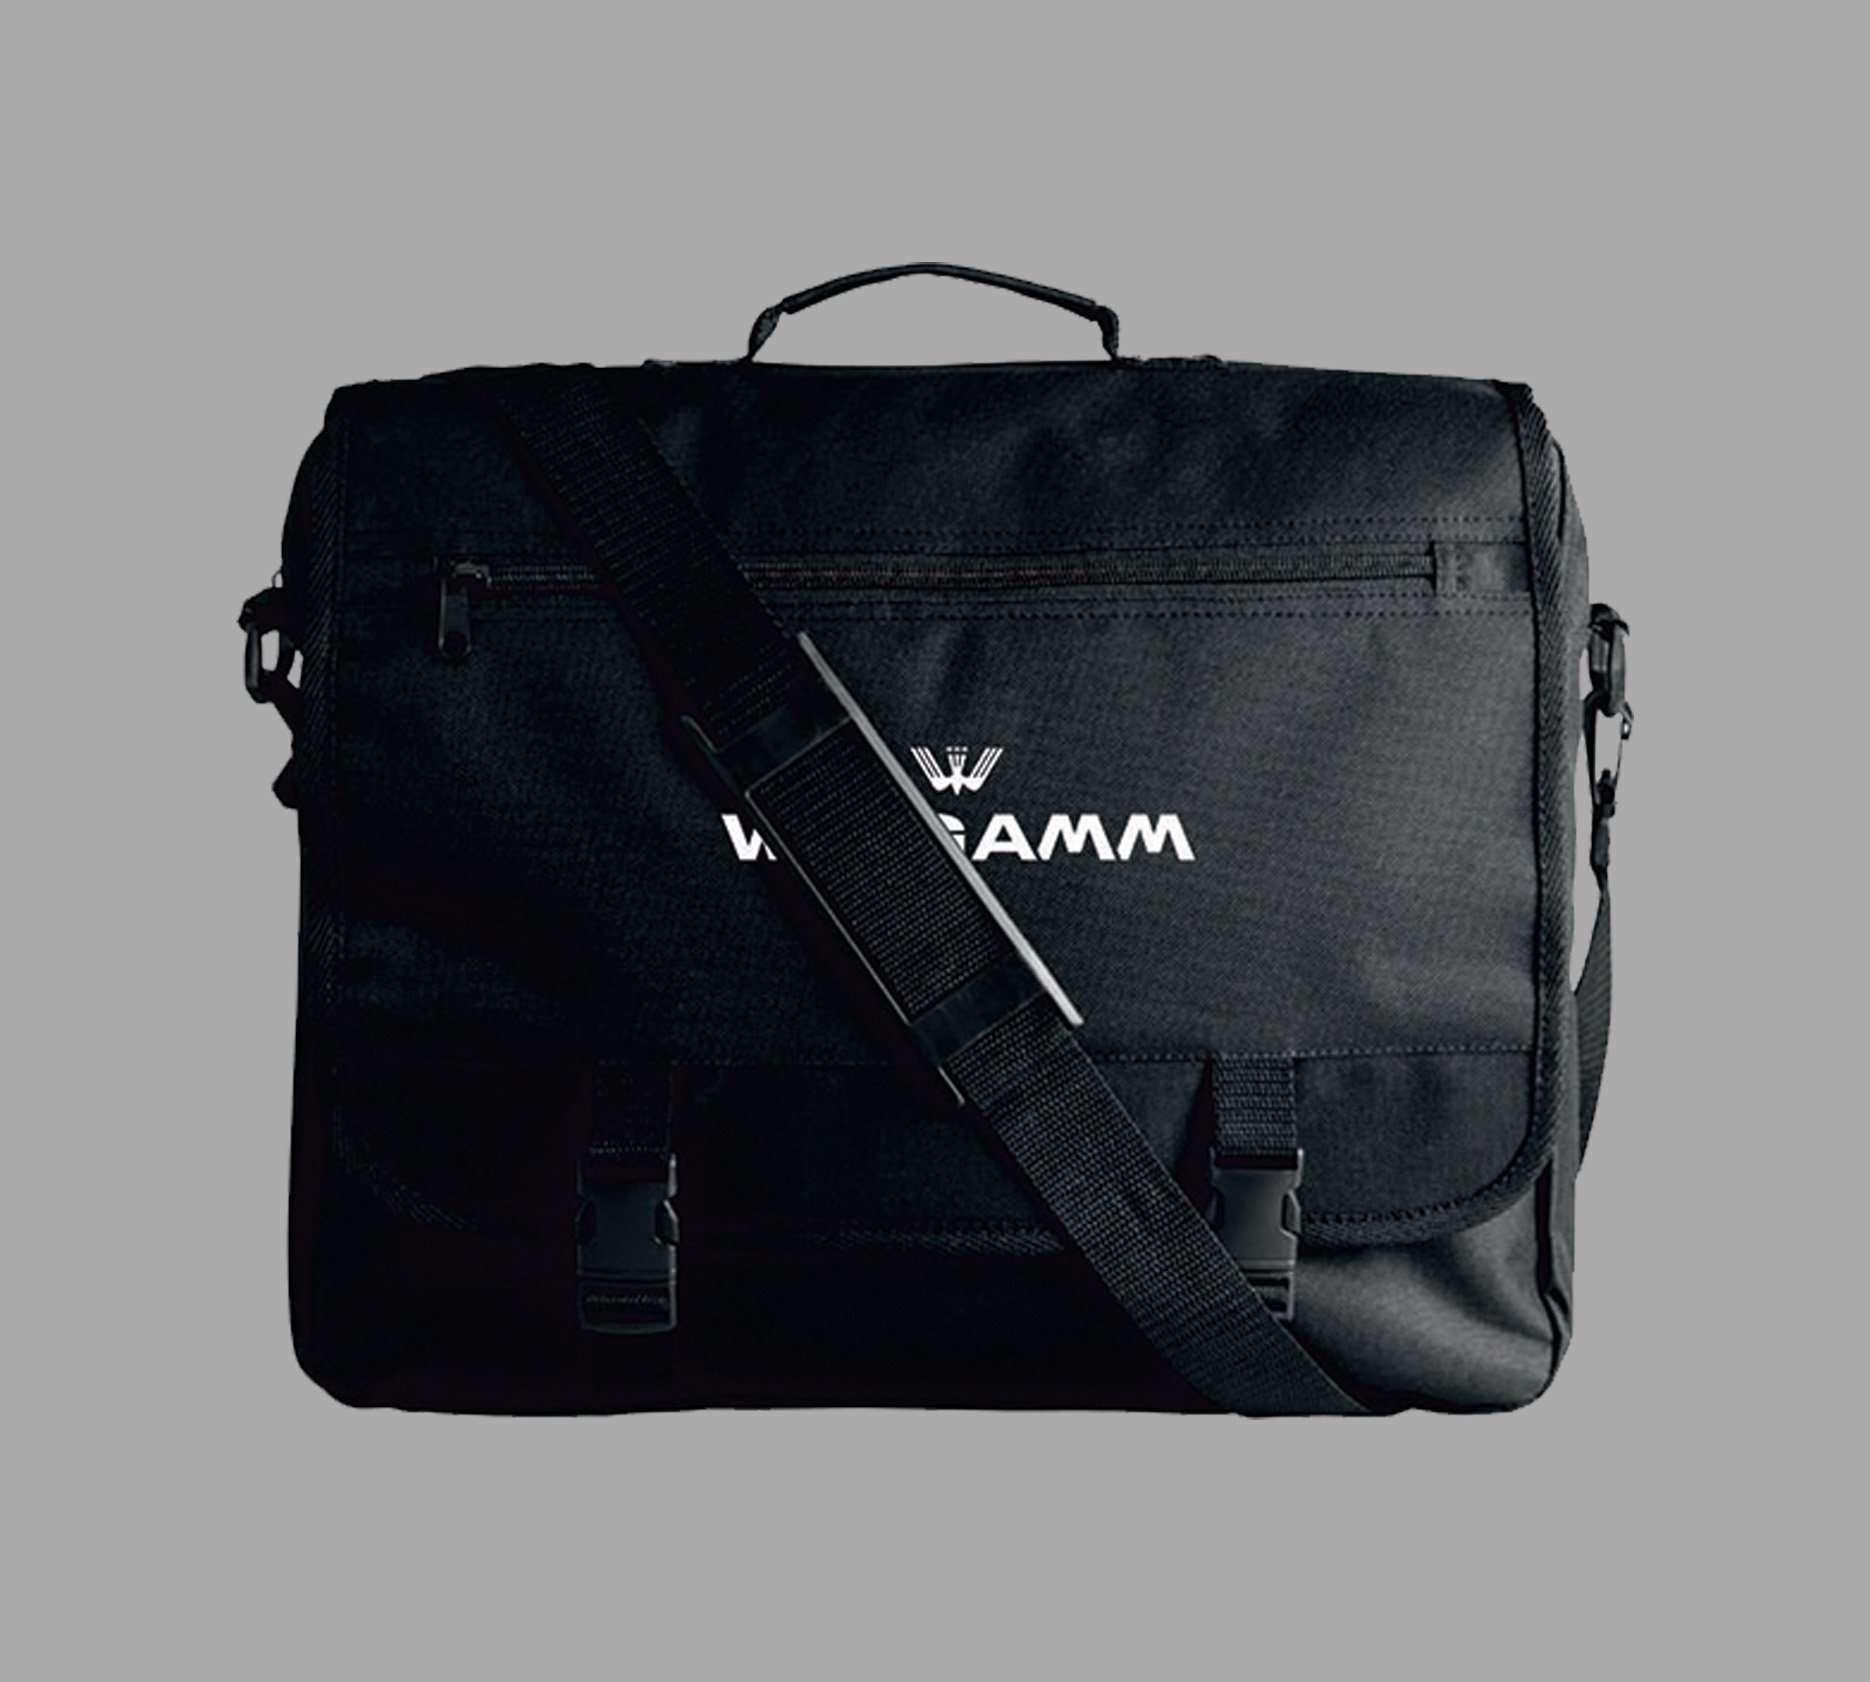 Borsa Laptop Wingamm - camper